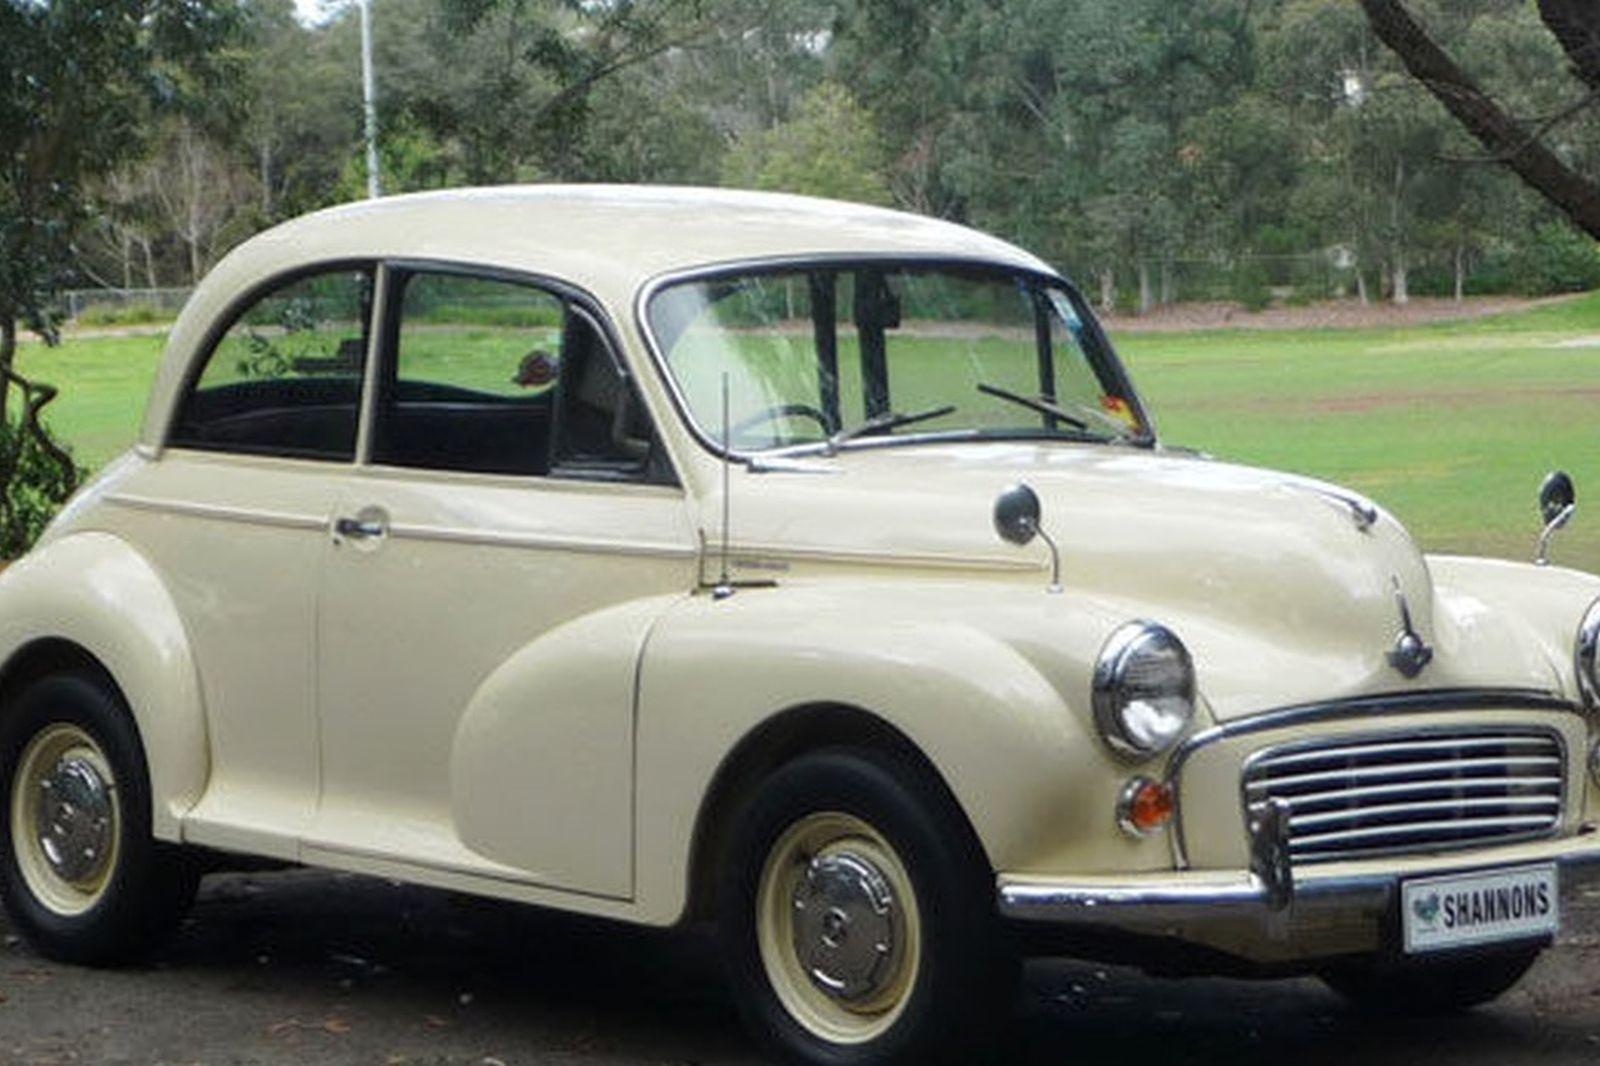 b39d19578c Sold  Morris Minor 2 Door  Modified  Sedan Auctions - Lot 16 - Shannons